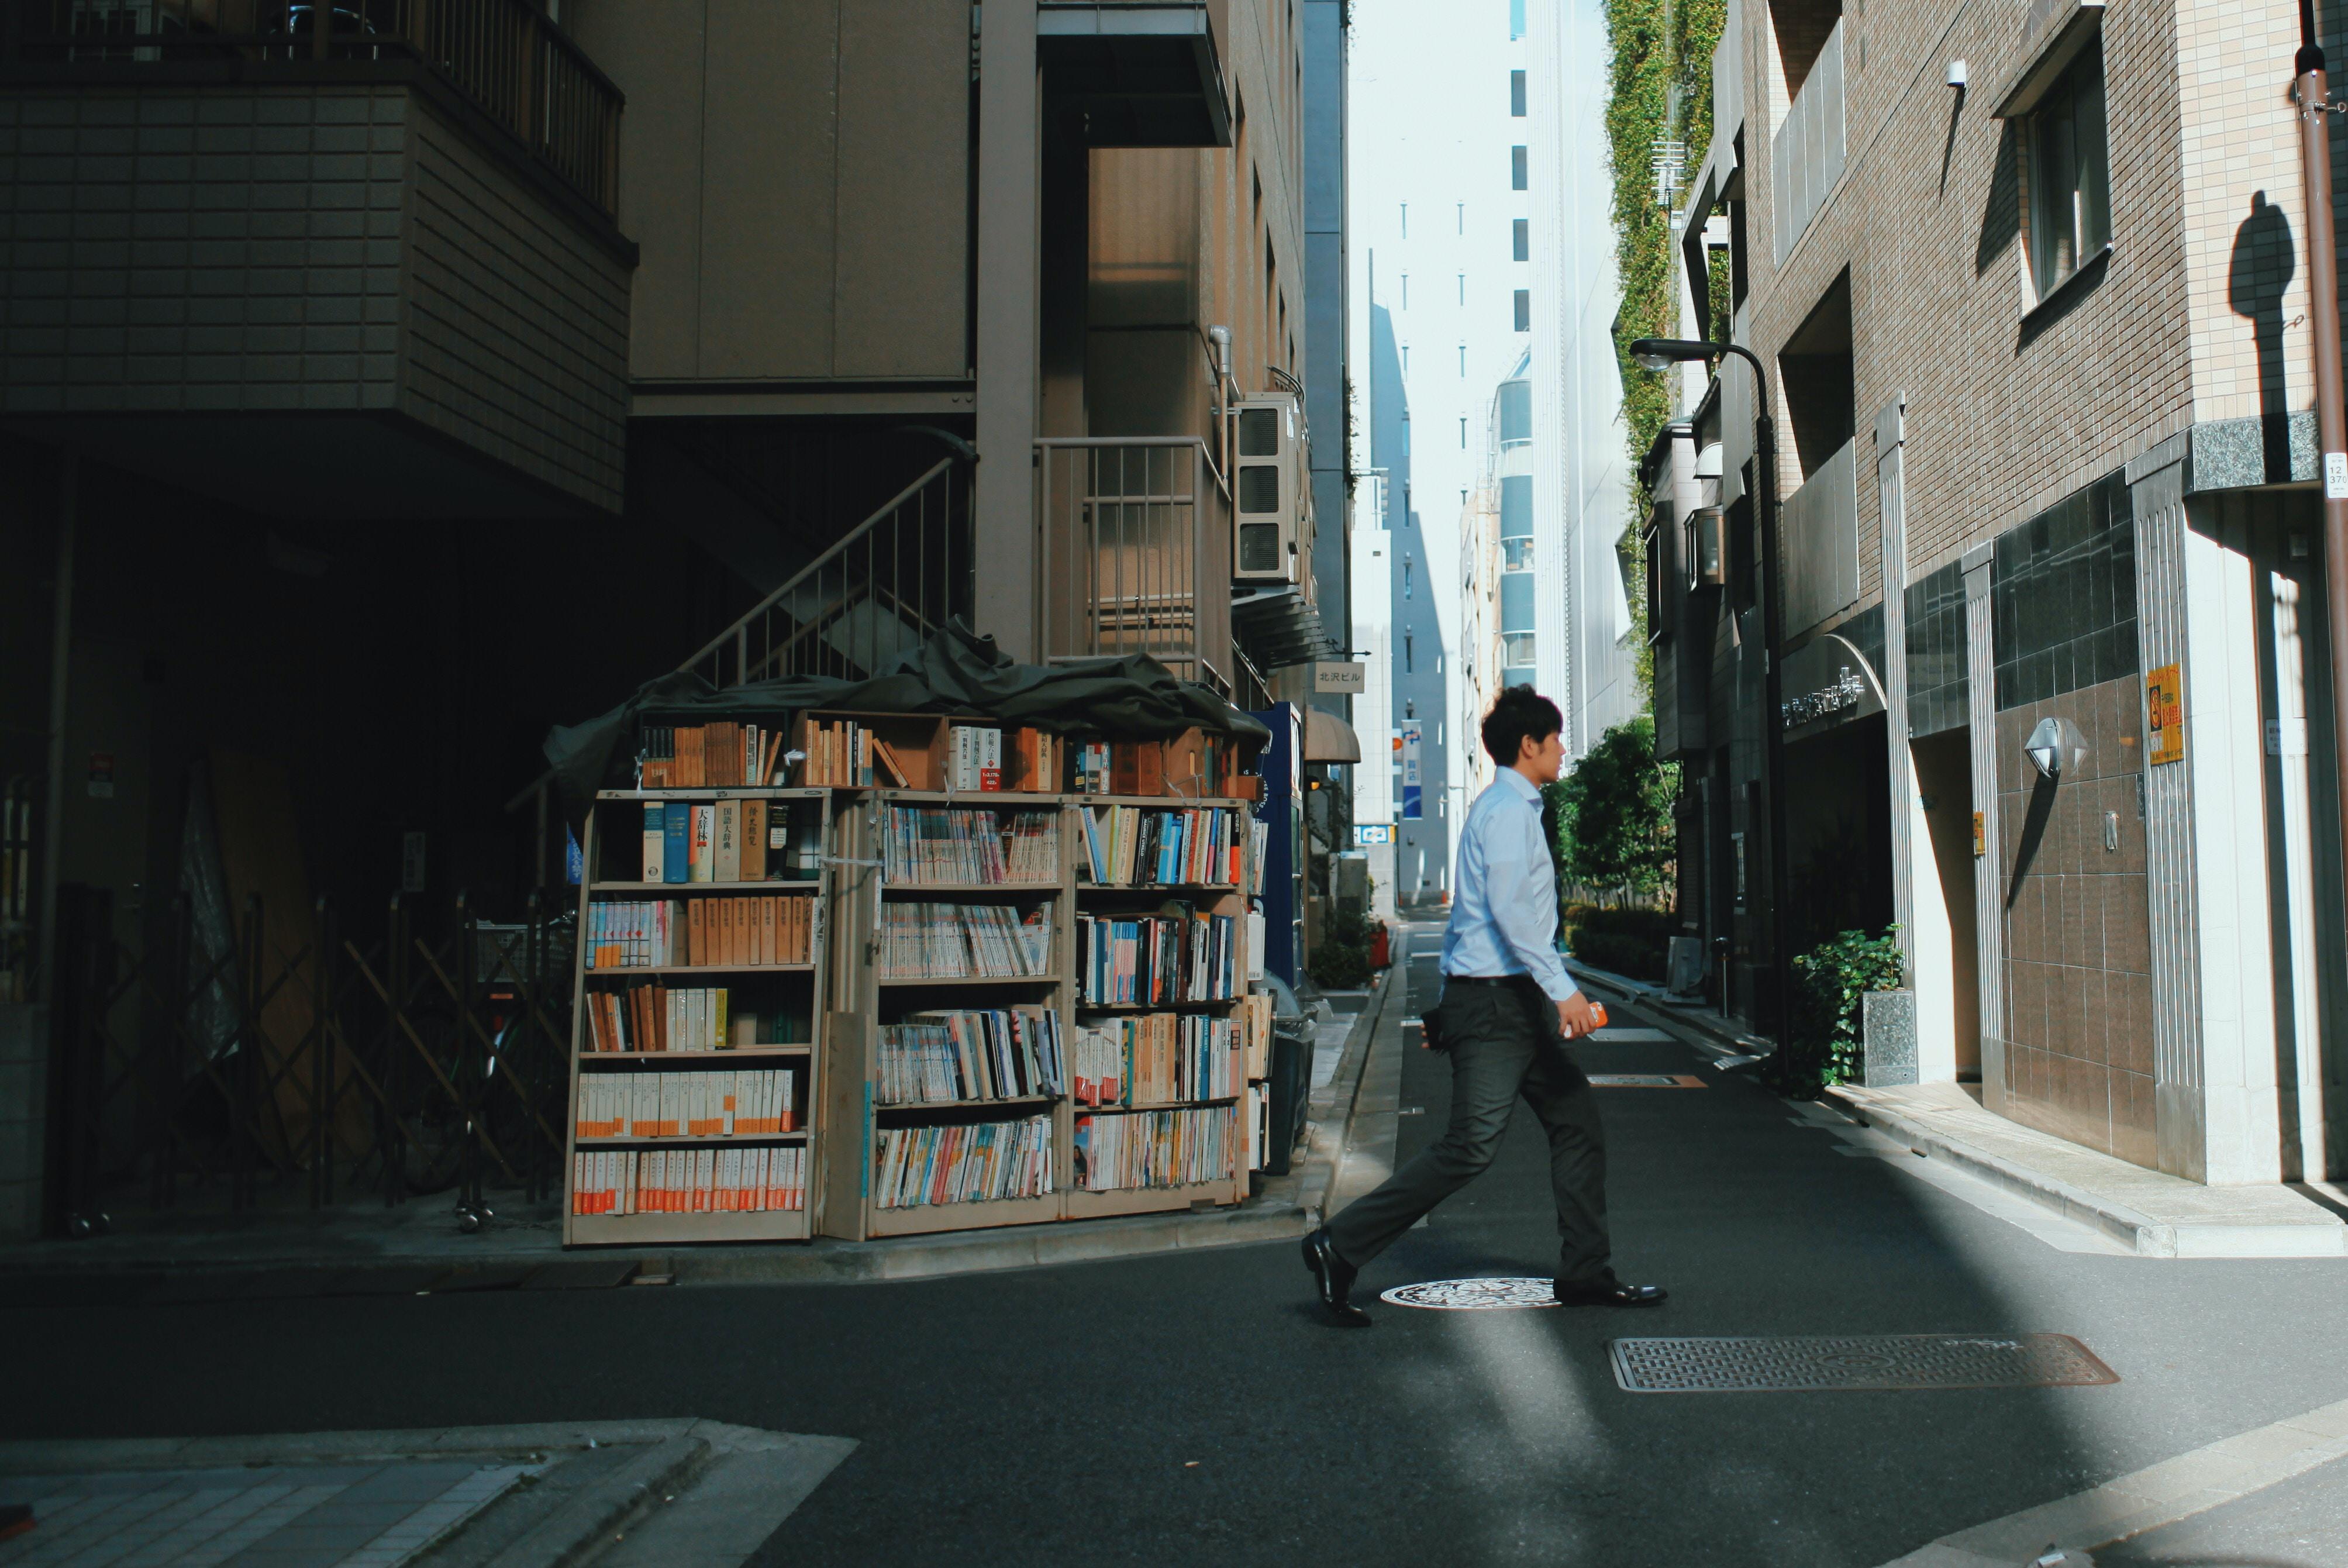 man crossing the street